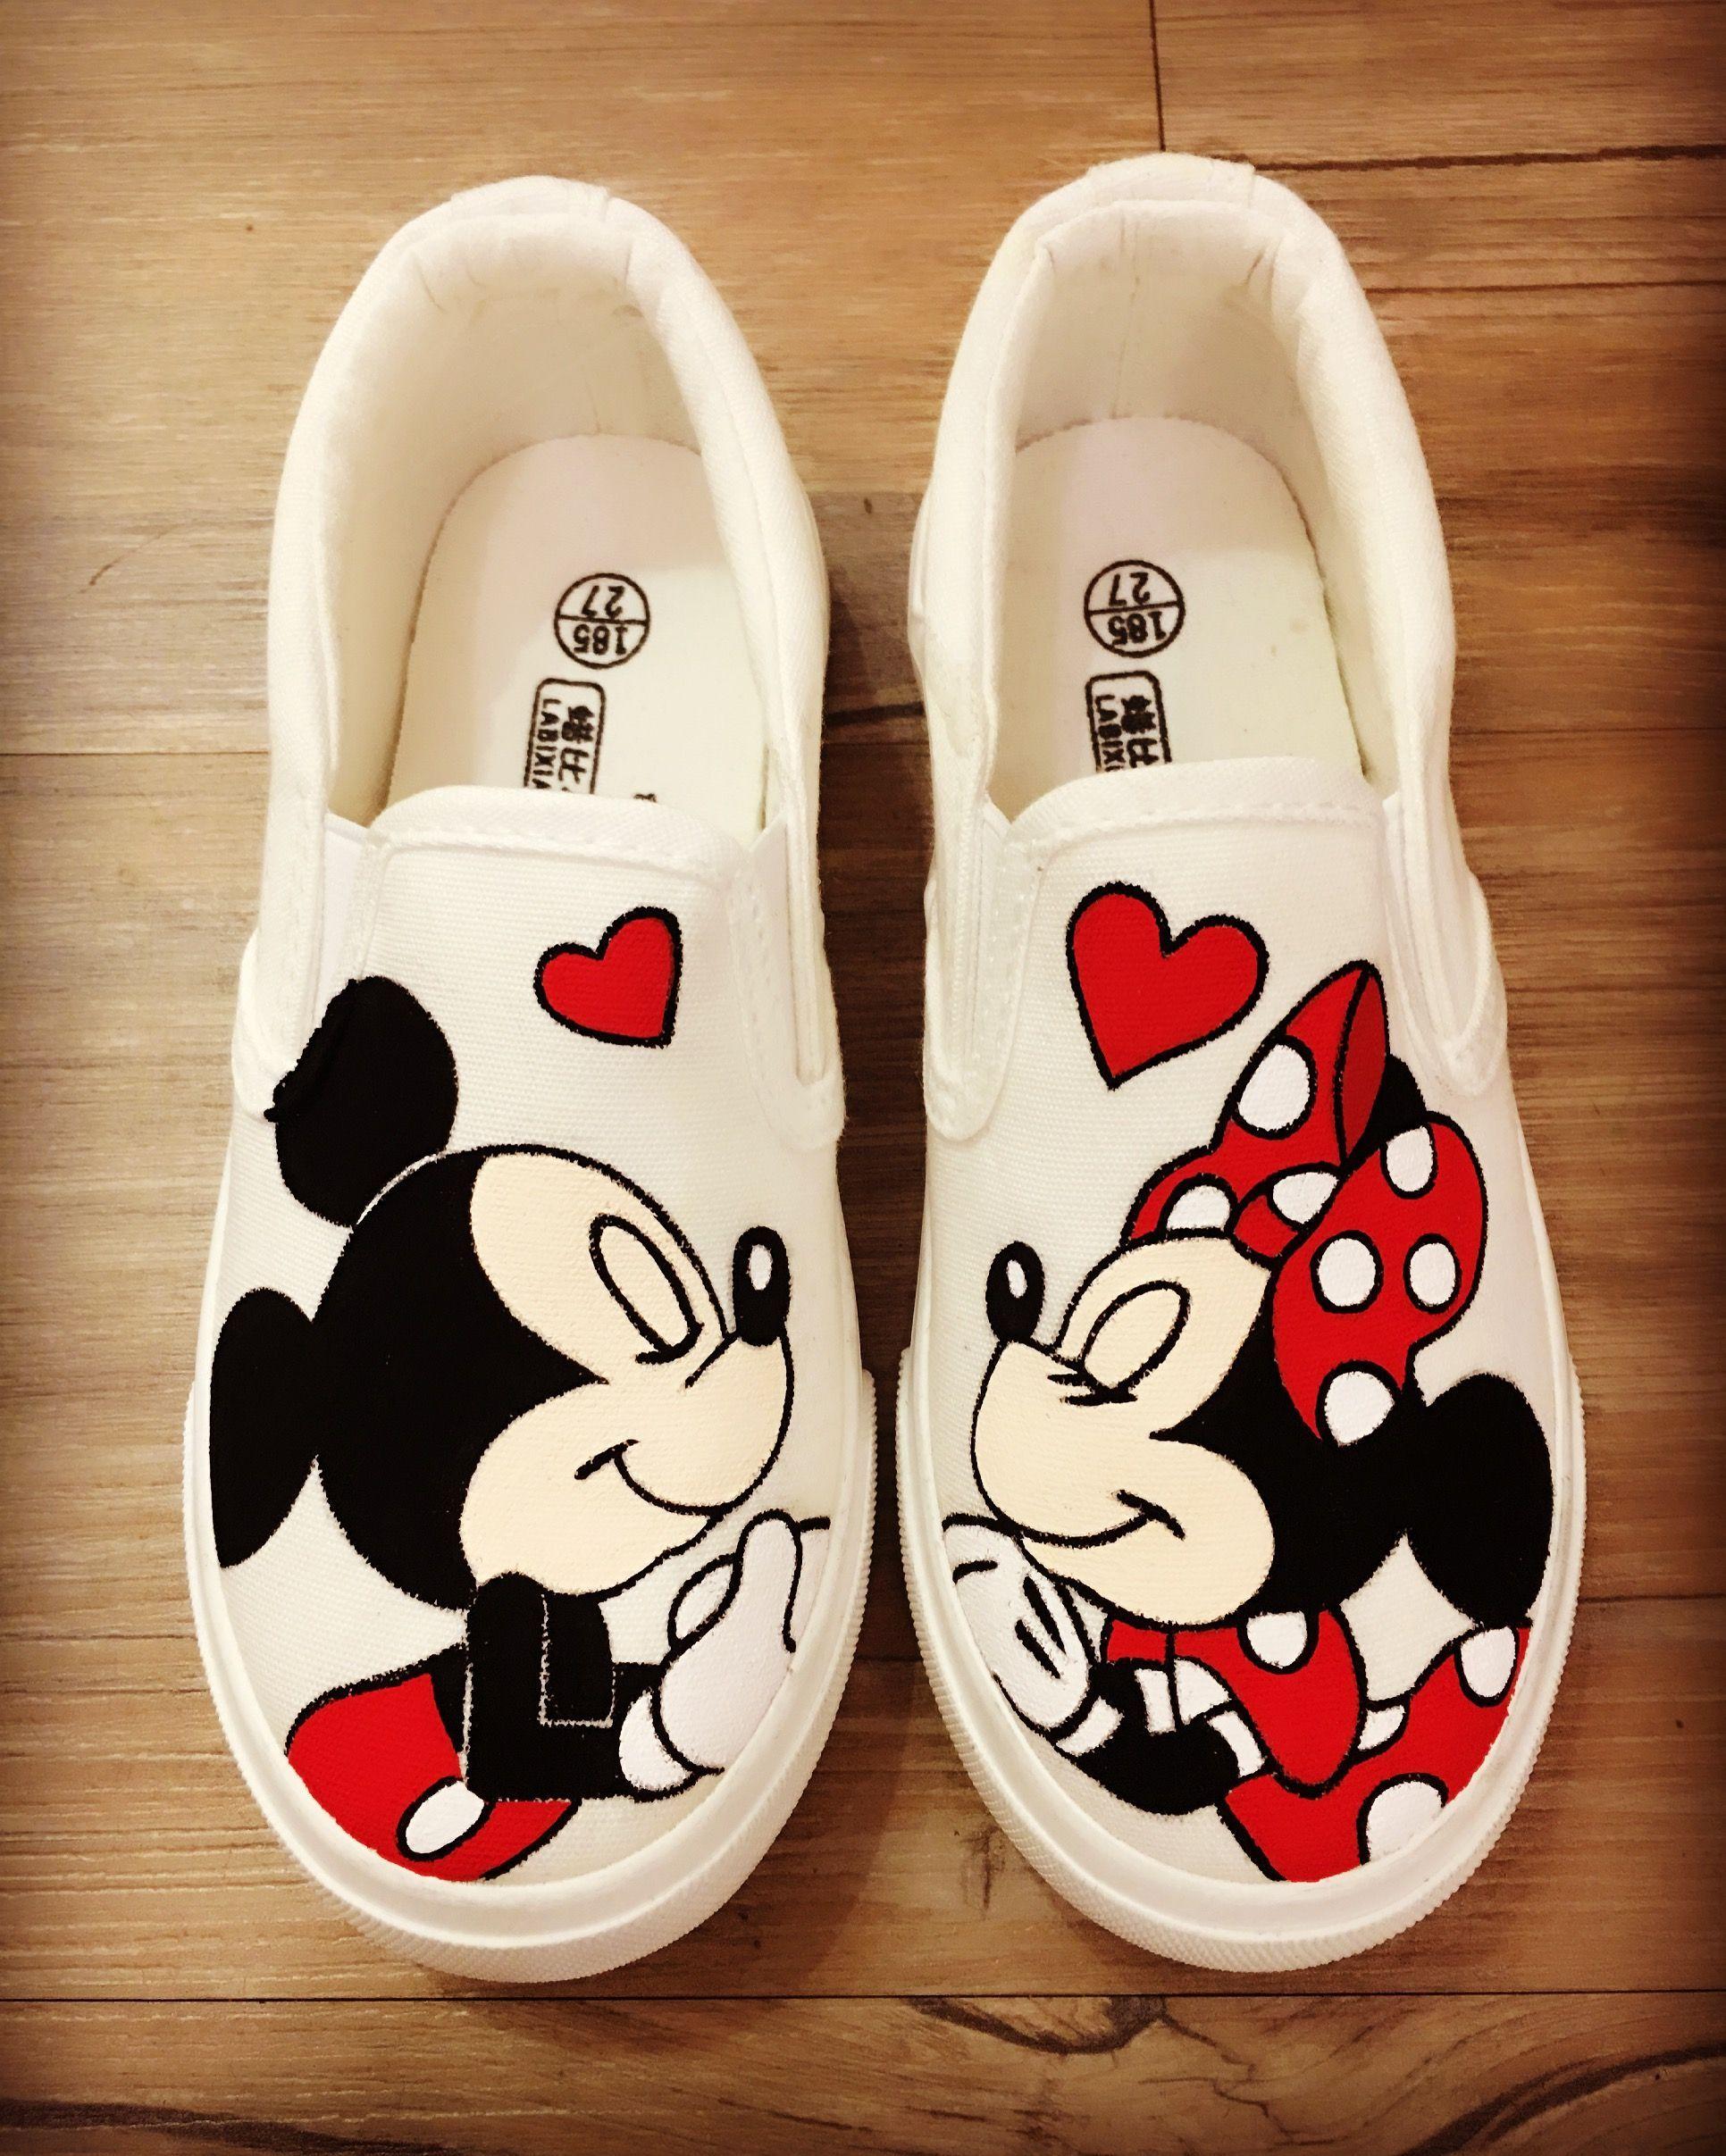 12+ Disney shoes for women ideas information